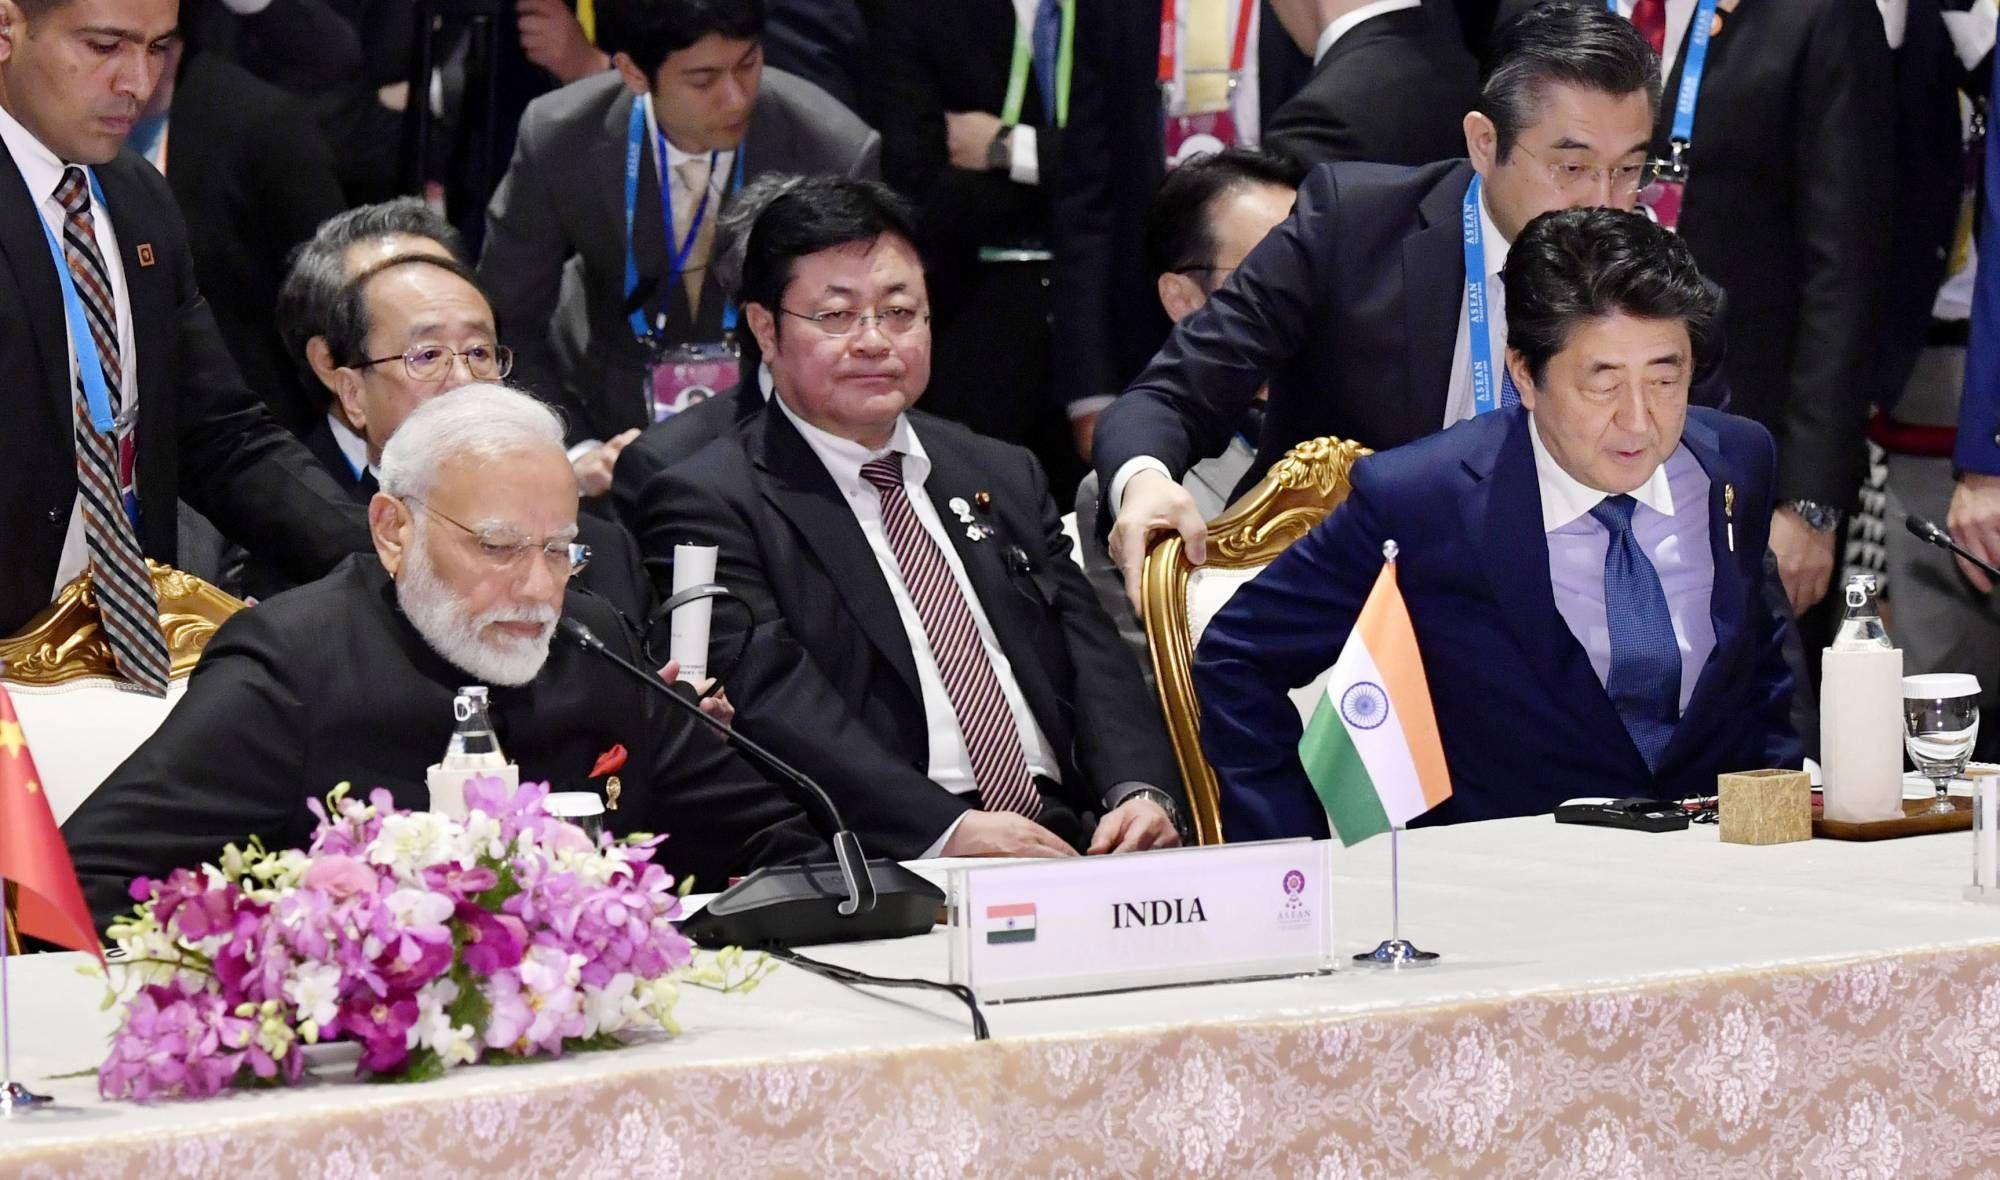 Japan and India sign military supply-sharing pact